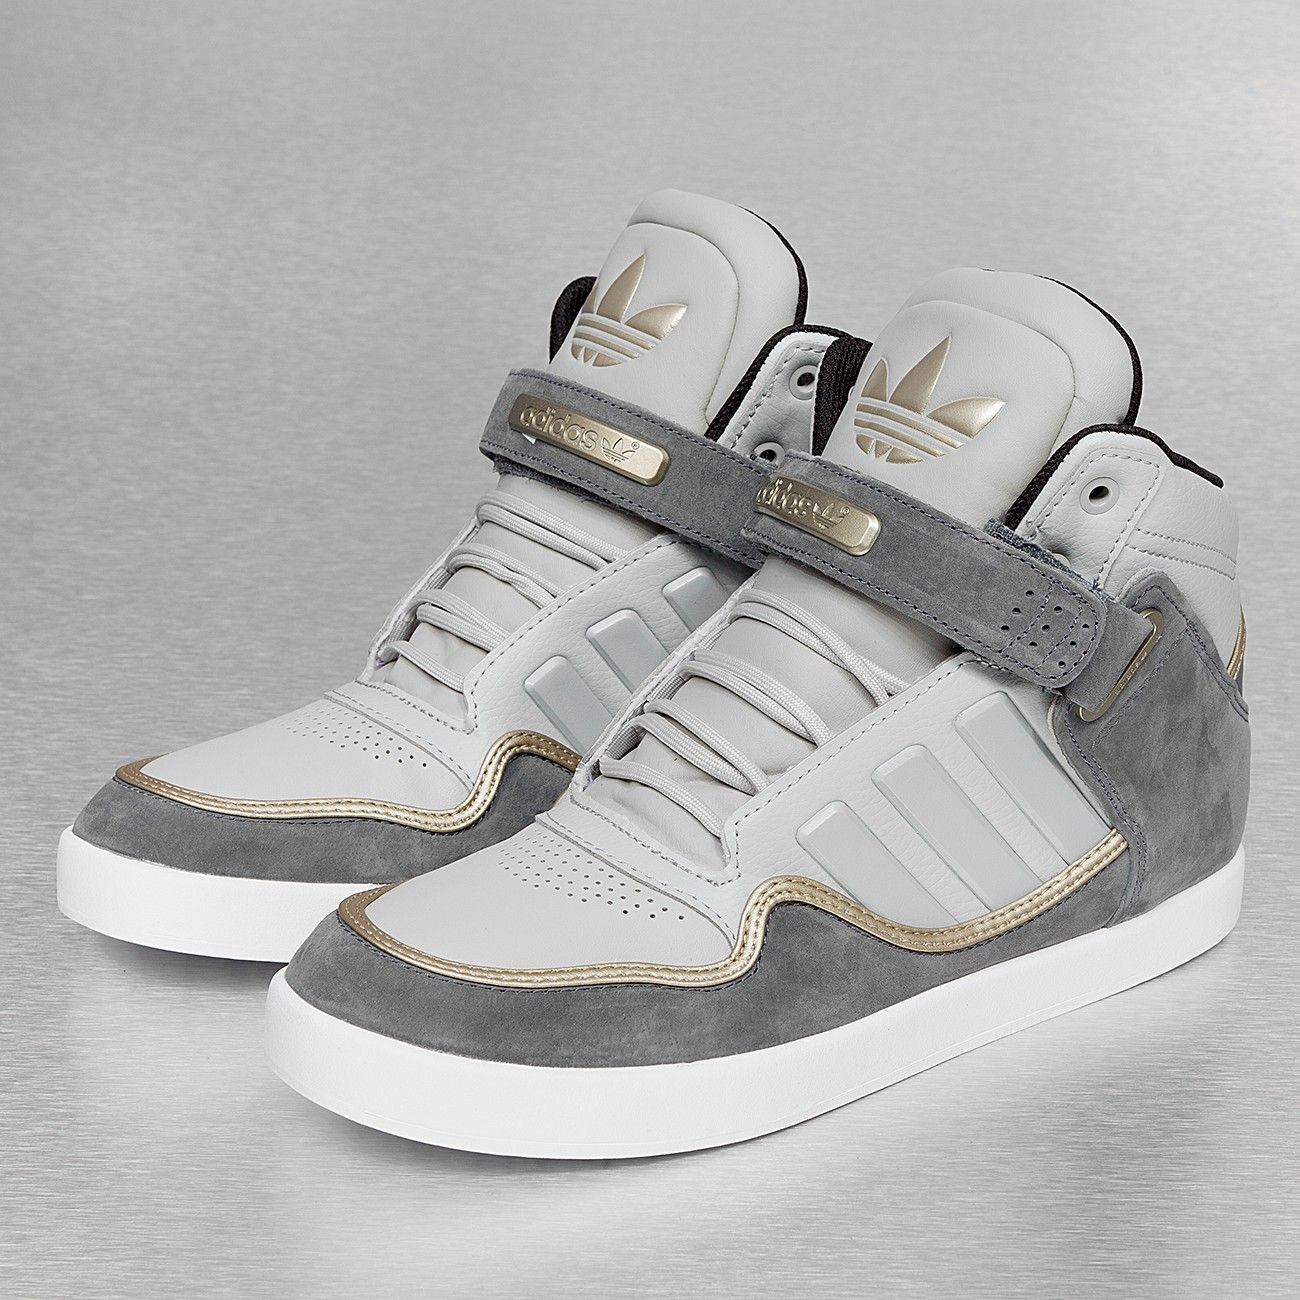 Adidas Baskets gris (avec images) | Baskets, Sneakers